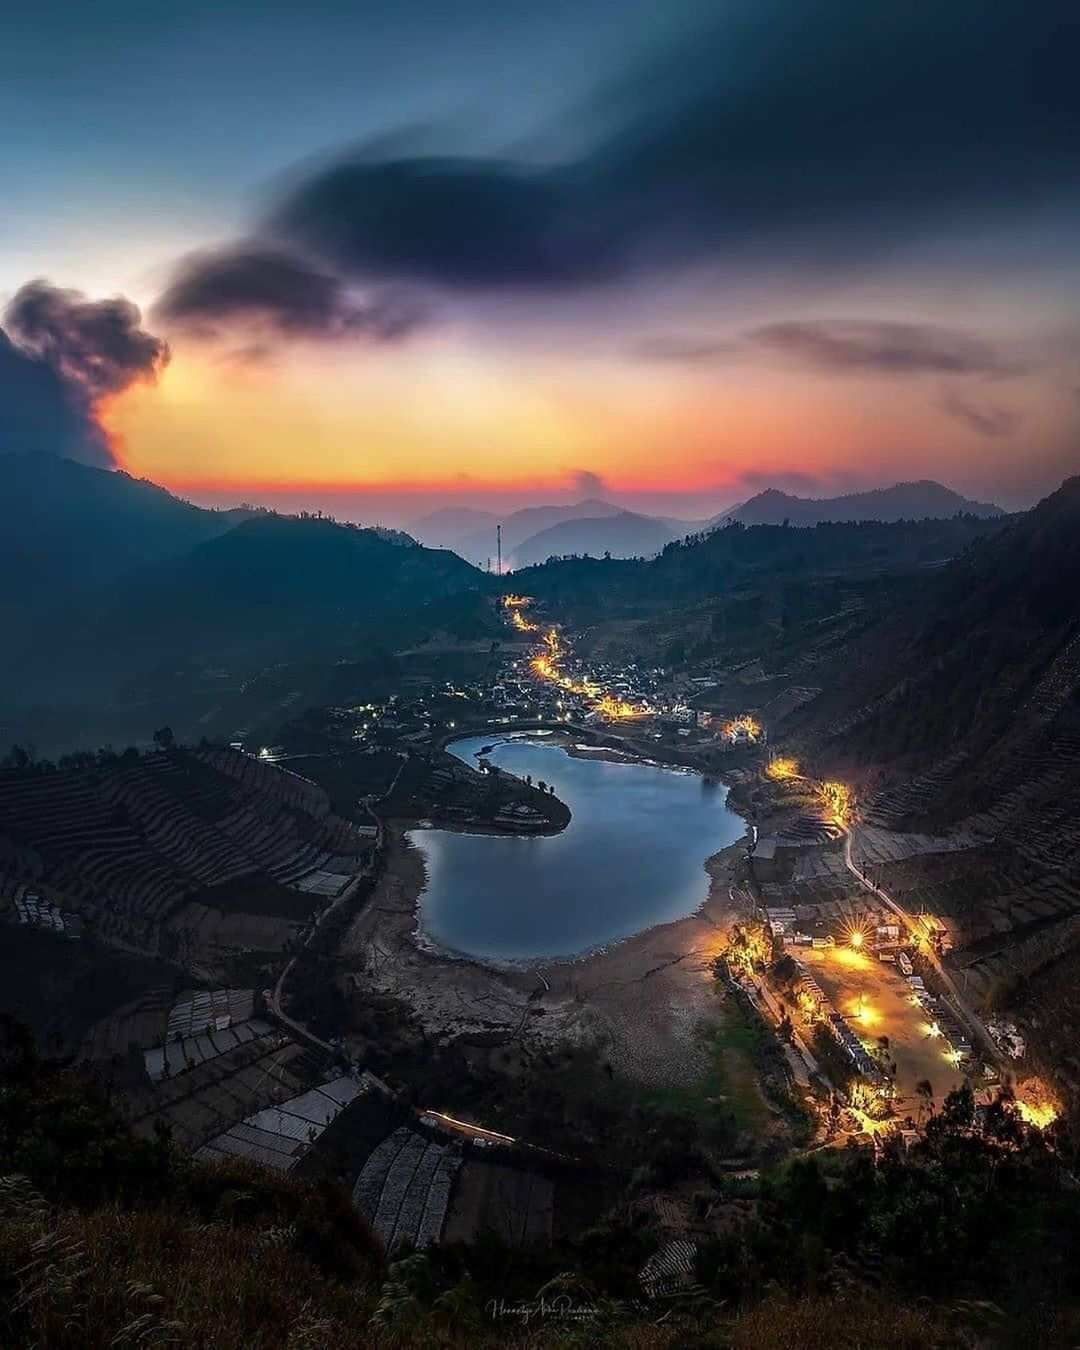 Lokasi Dan Harga Tiket Bukit Sikunir Dieng Mei 2020